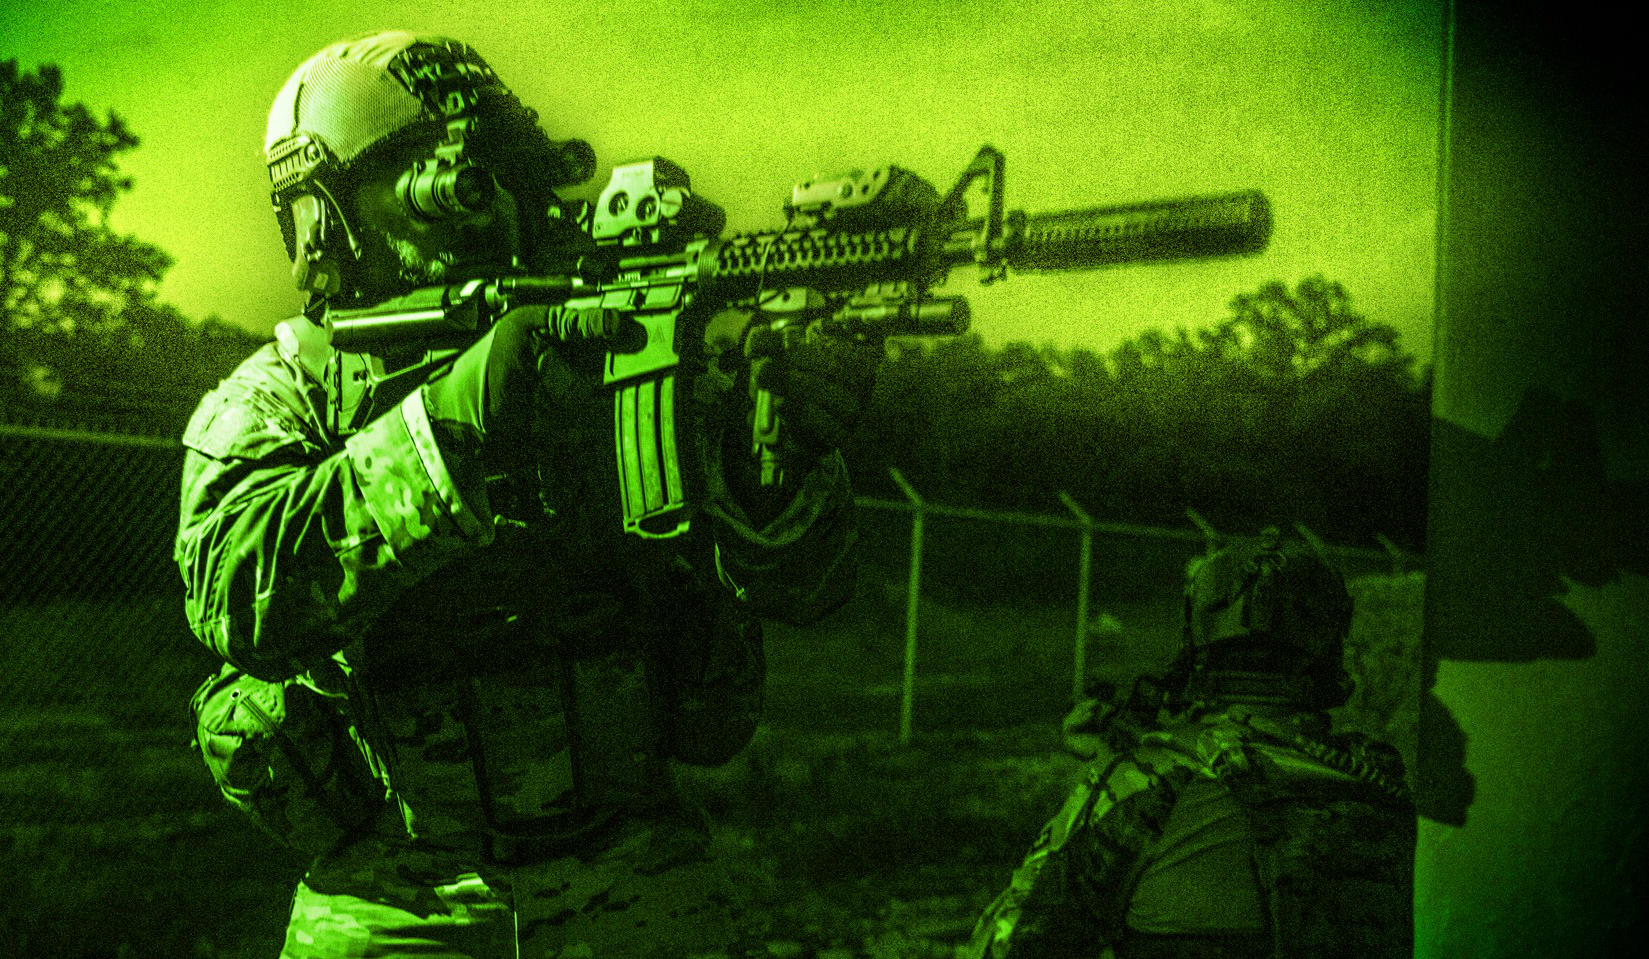 st louis gun store night vision suppressors